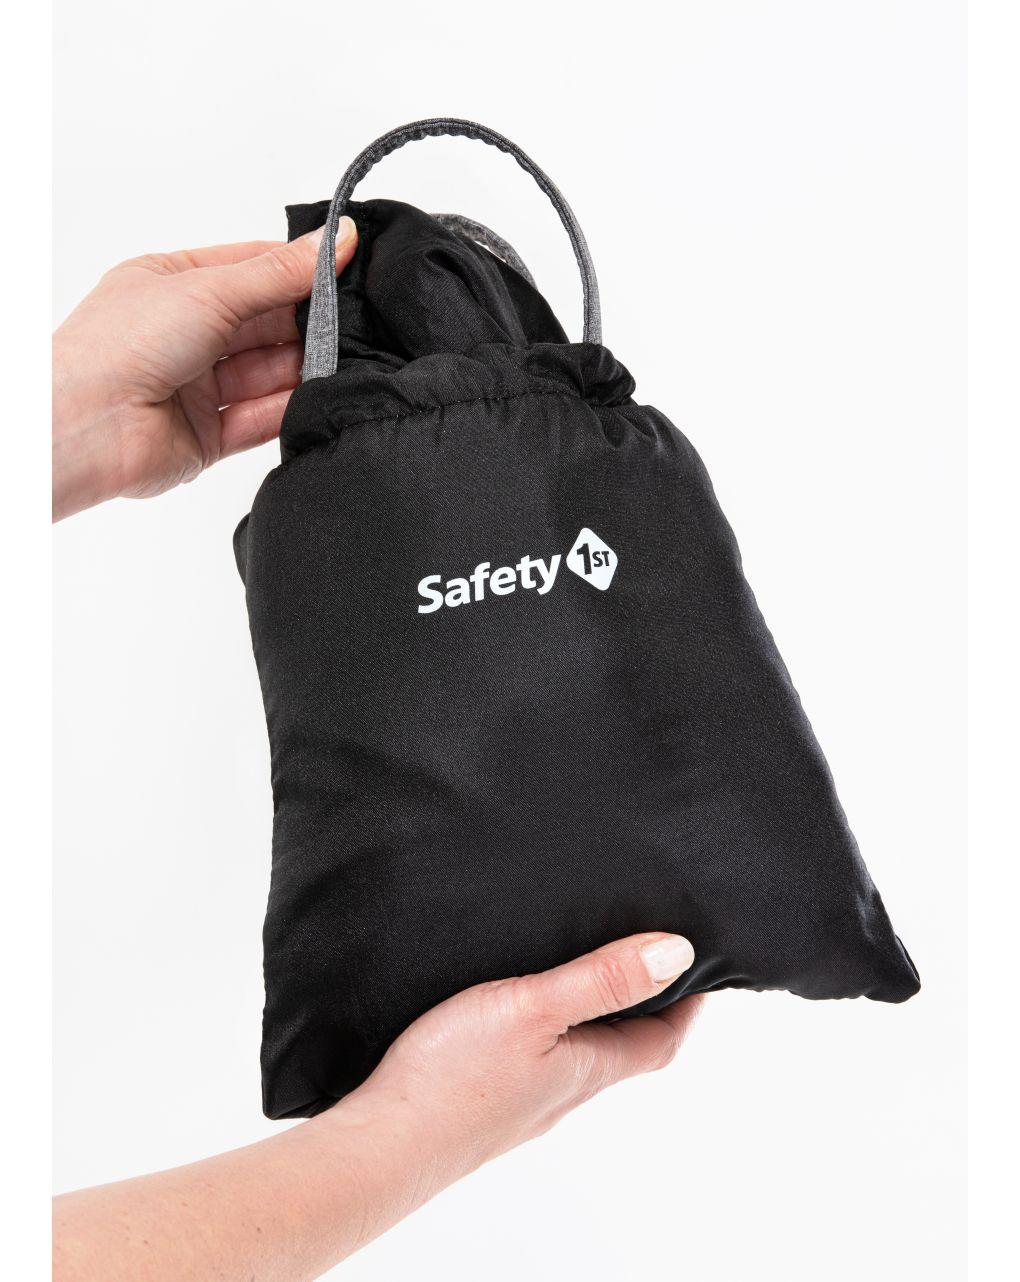 Proteggi carrello caddy protect - Safety 1st